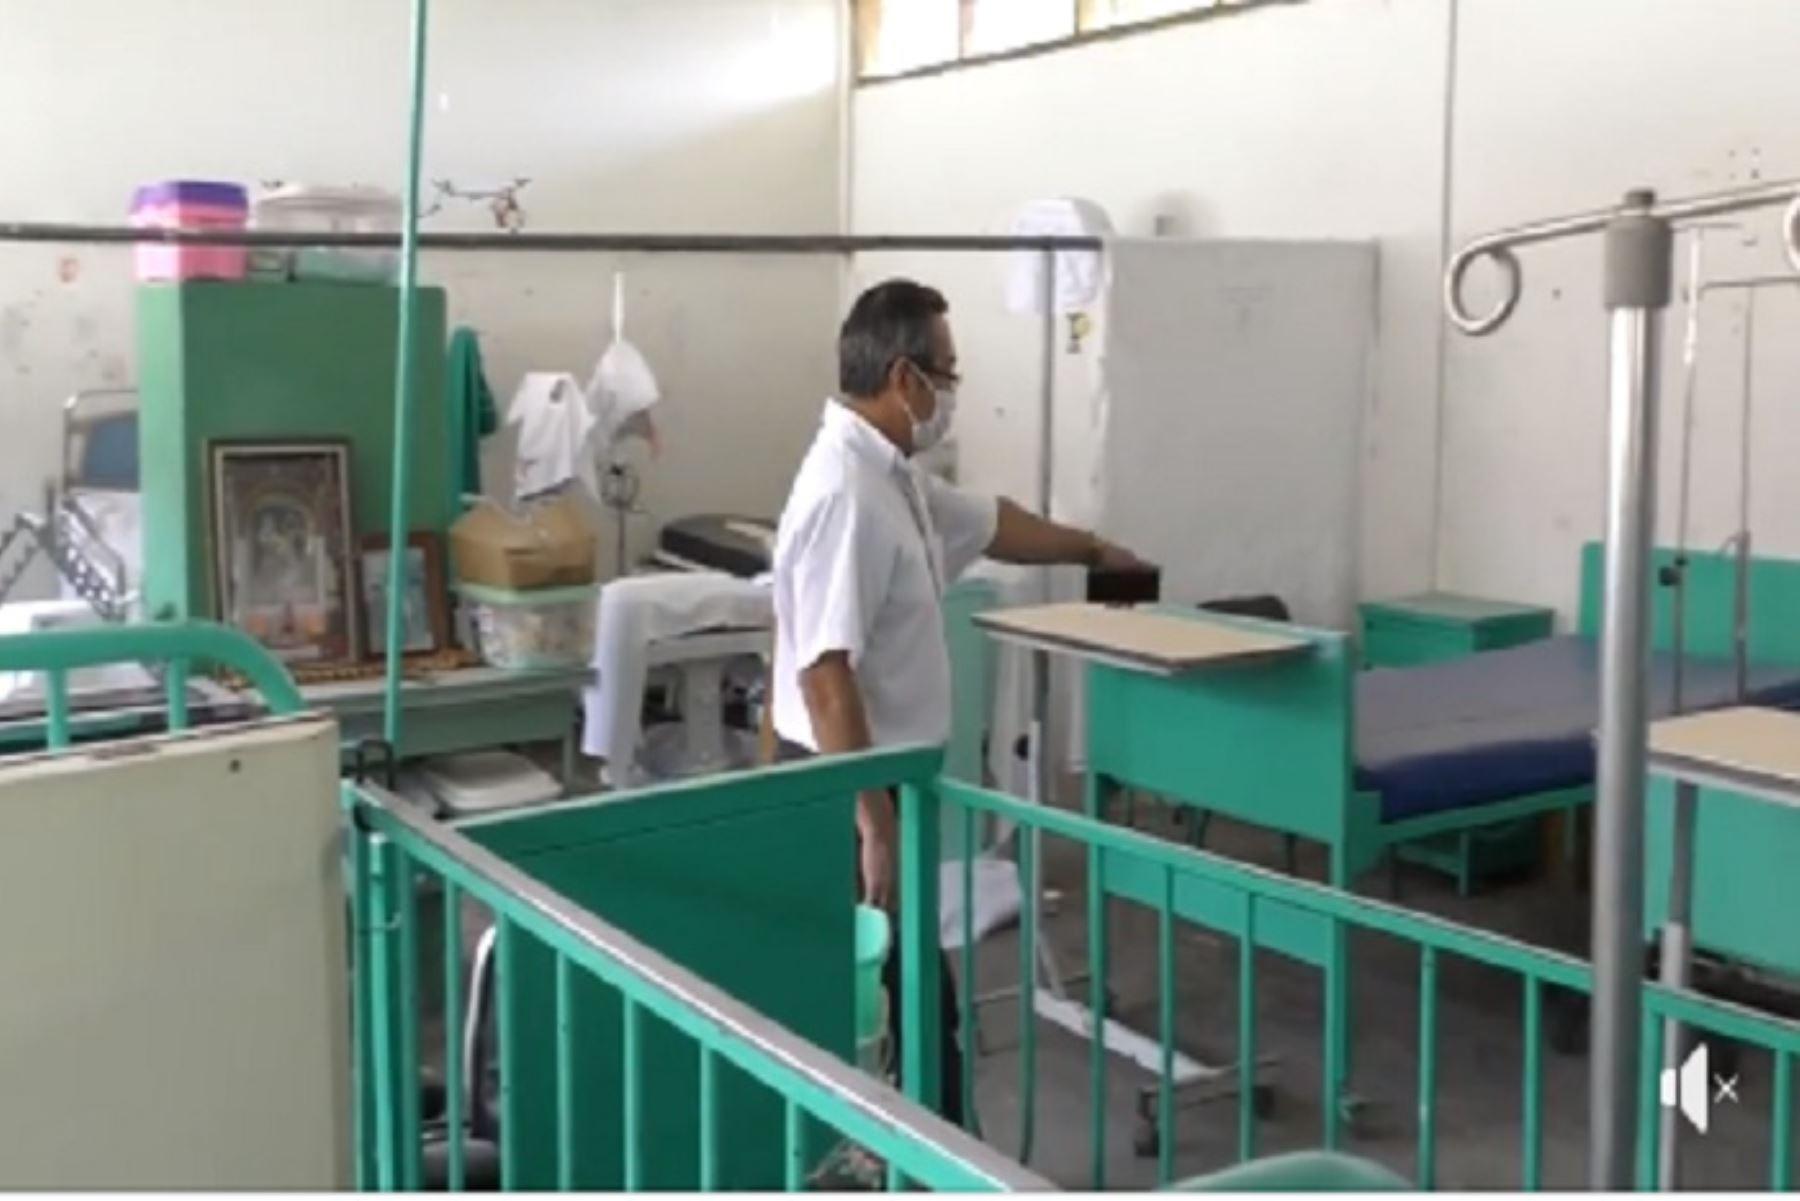 Los avances de la obra, a nivel general, están en un 59%, explicó el director del Hospital Santa Rosa, Mario Paredes,  a la comitiva.